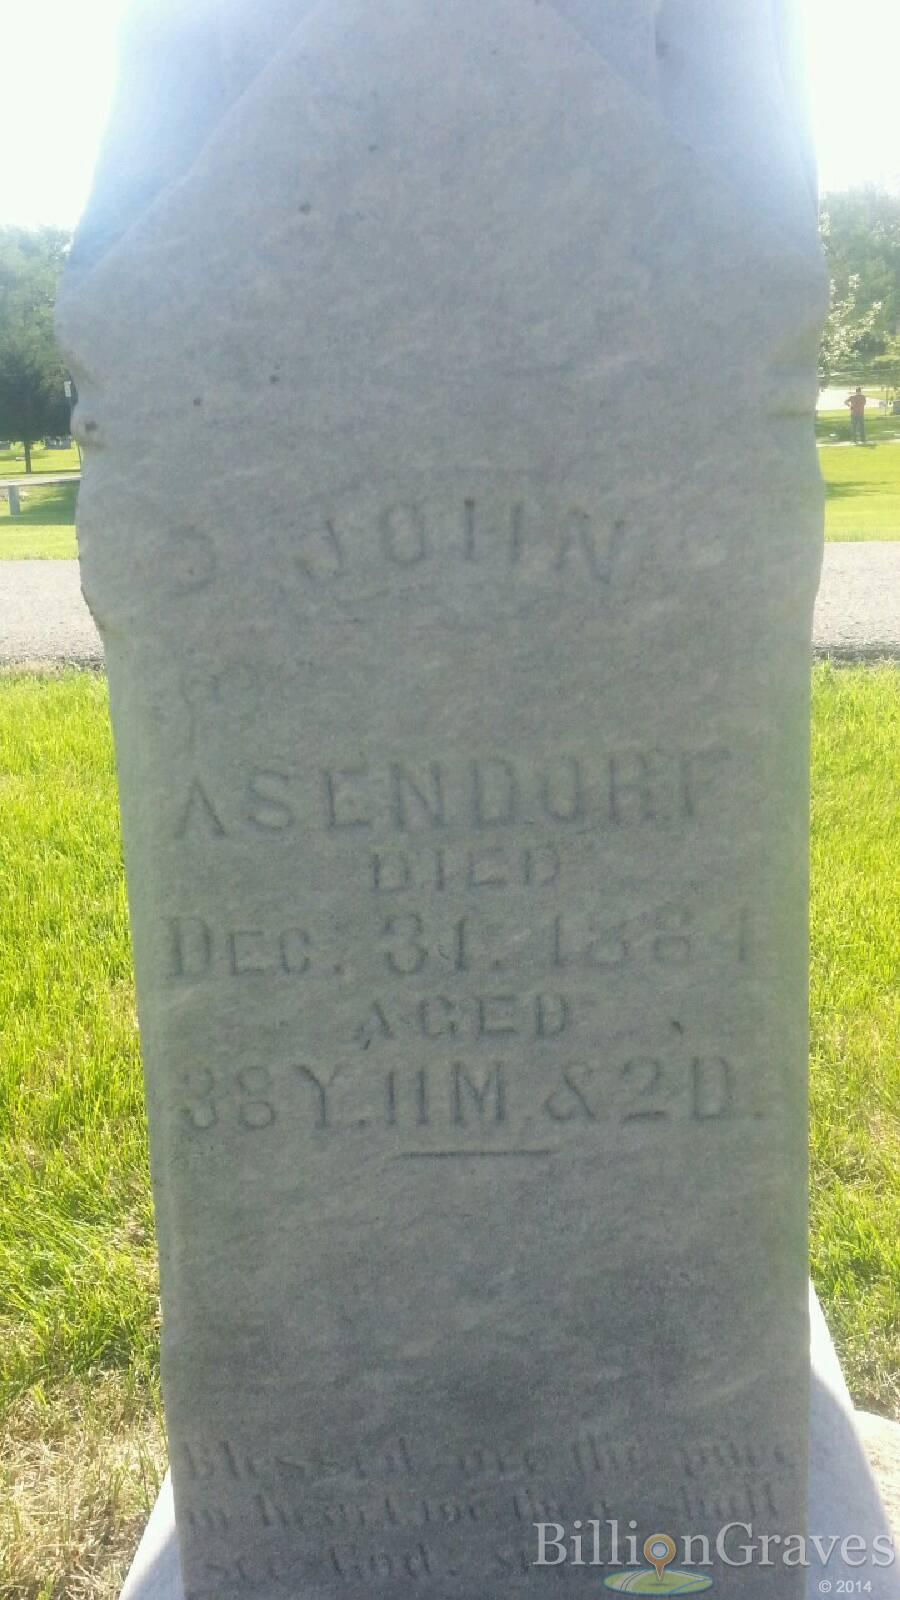 Grave Site of Henry Schumacher (-1894) | BillionGraves